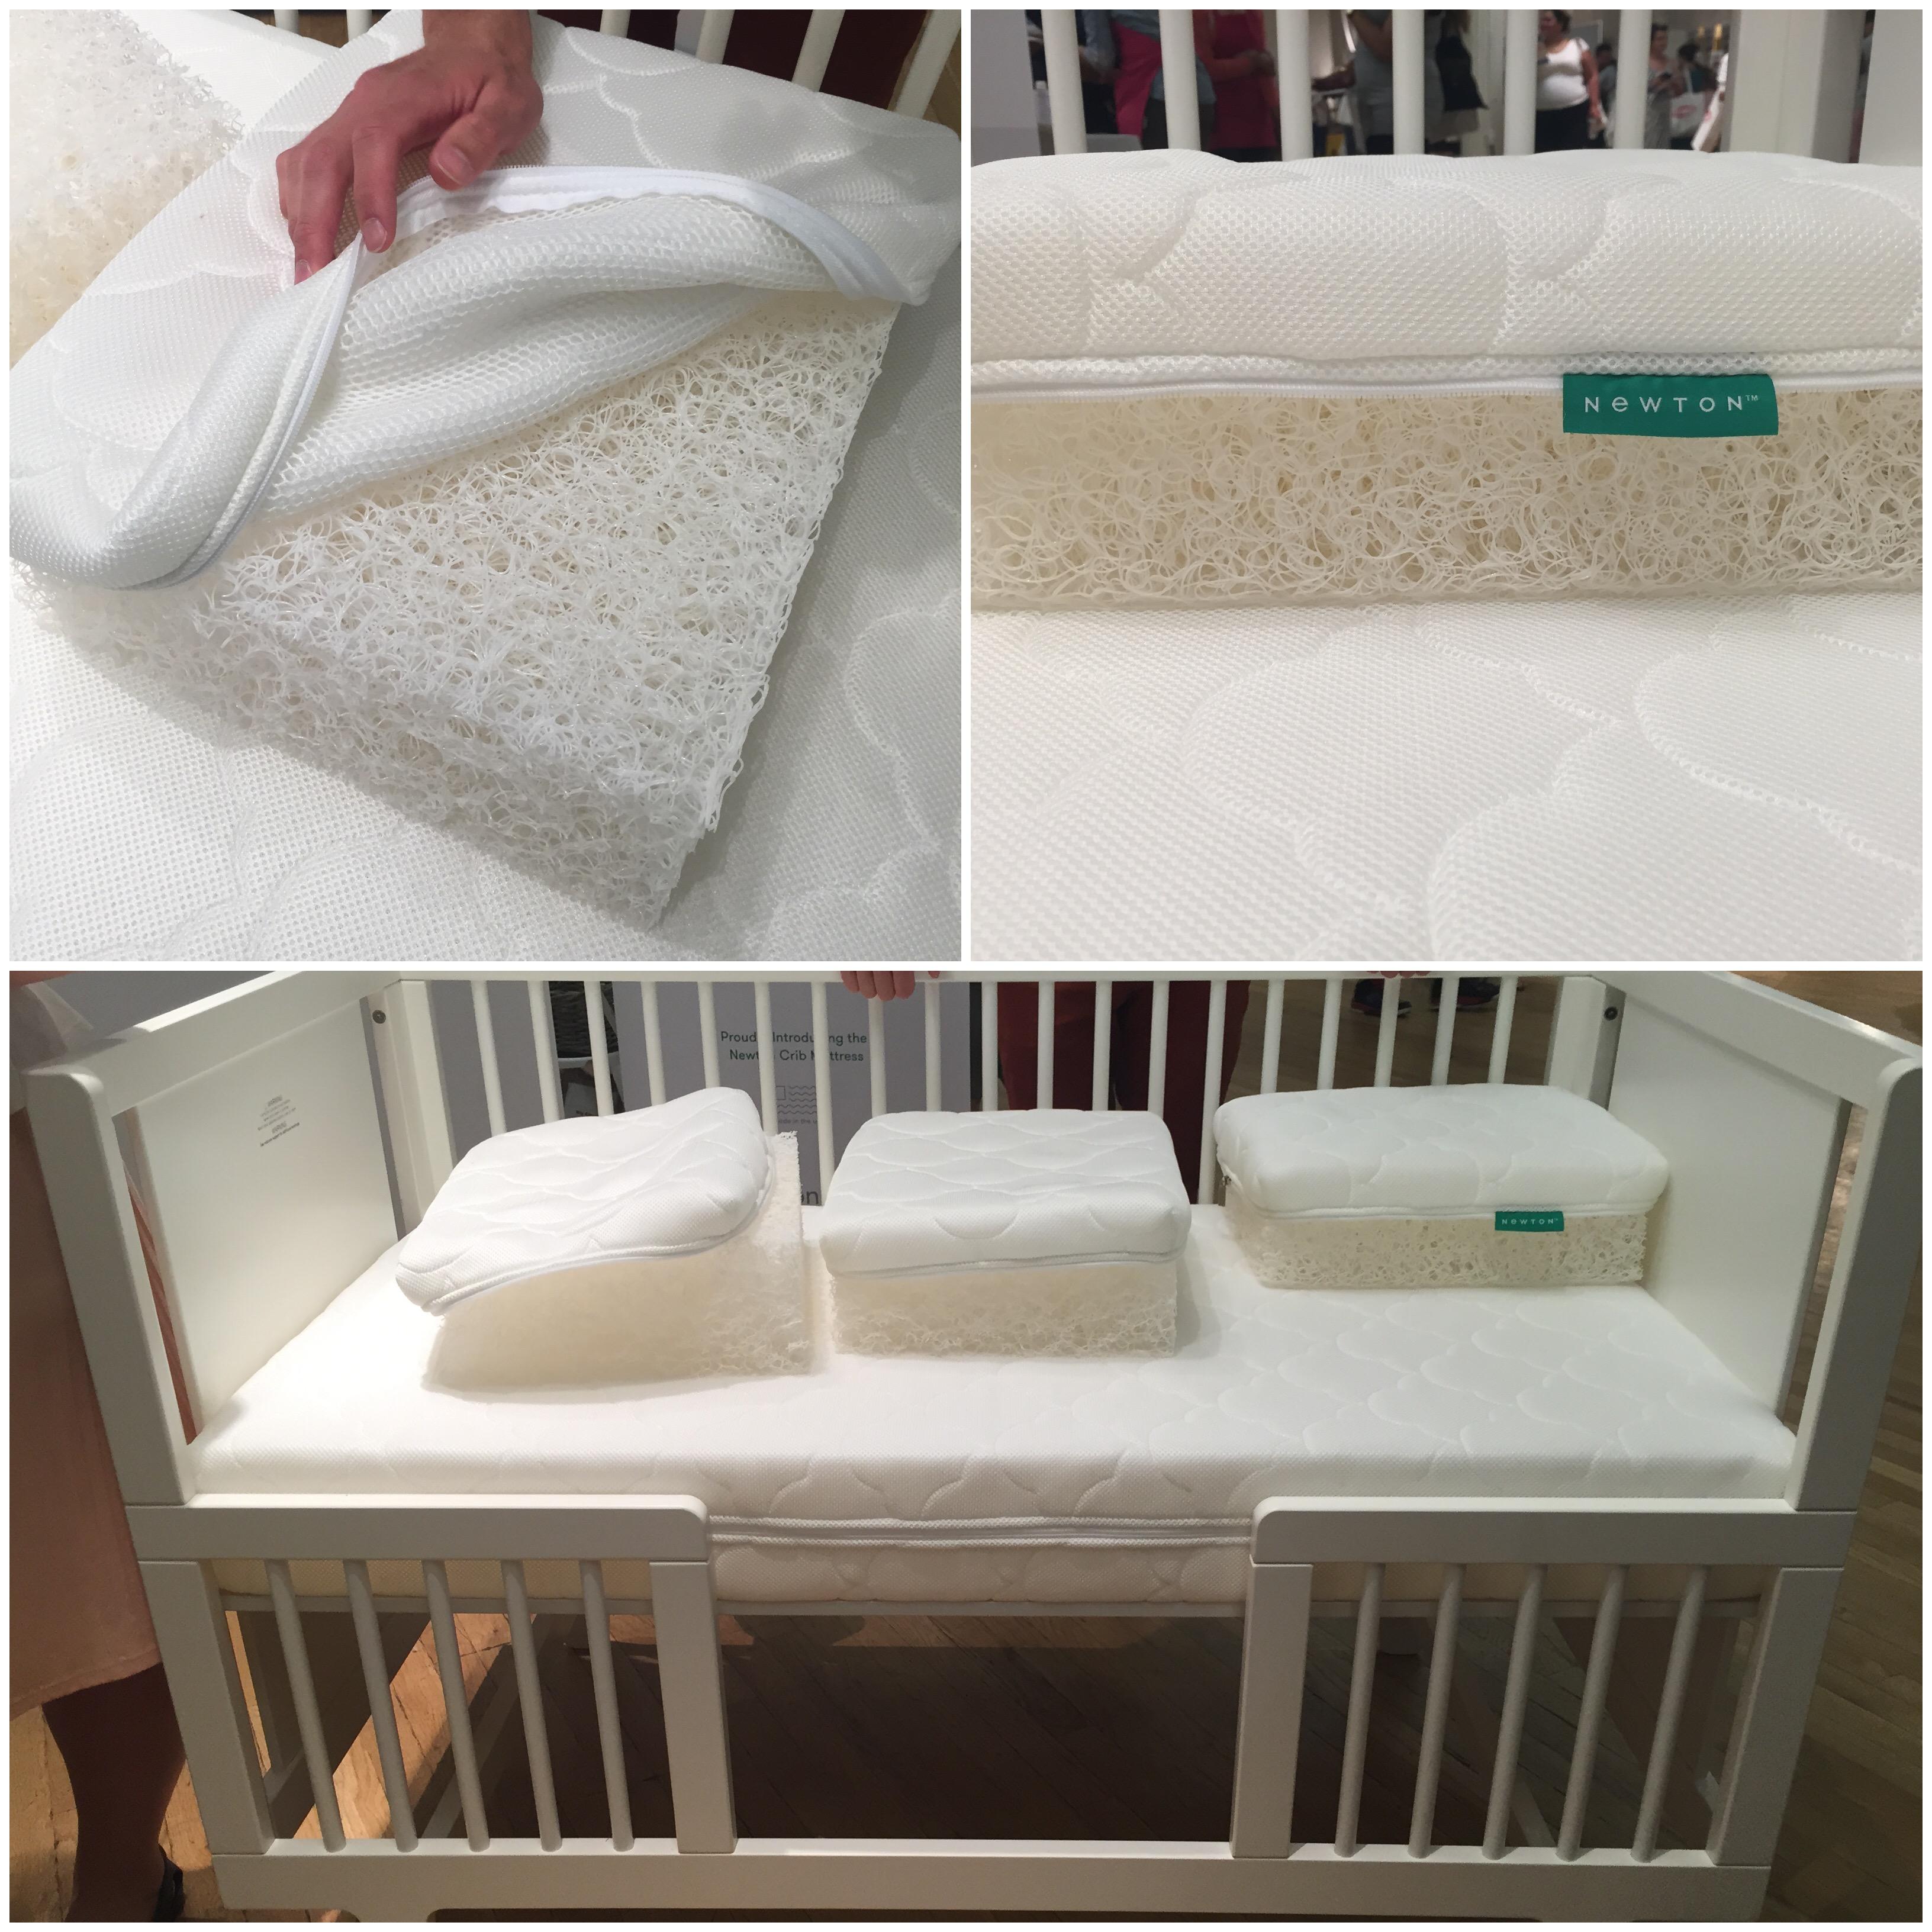 Best new baby products, Biggest Baby Shower | My Strange ...